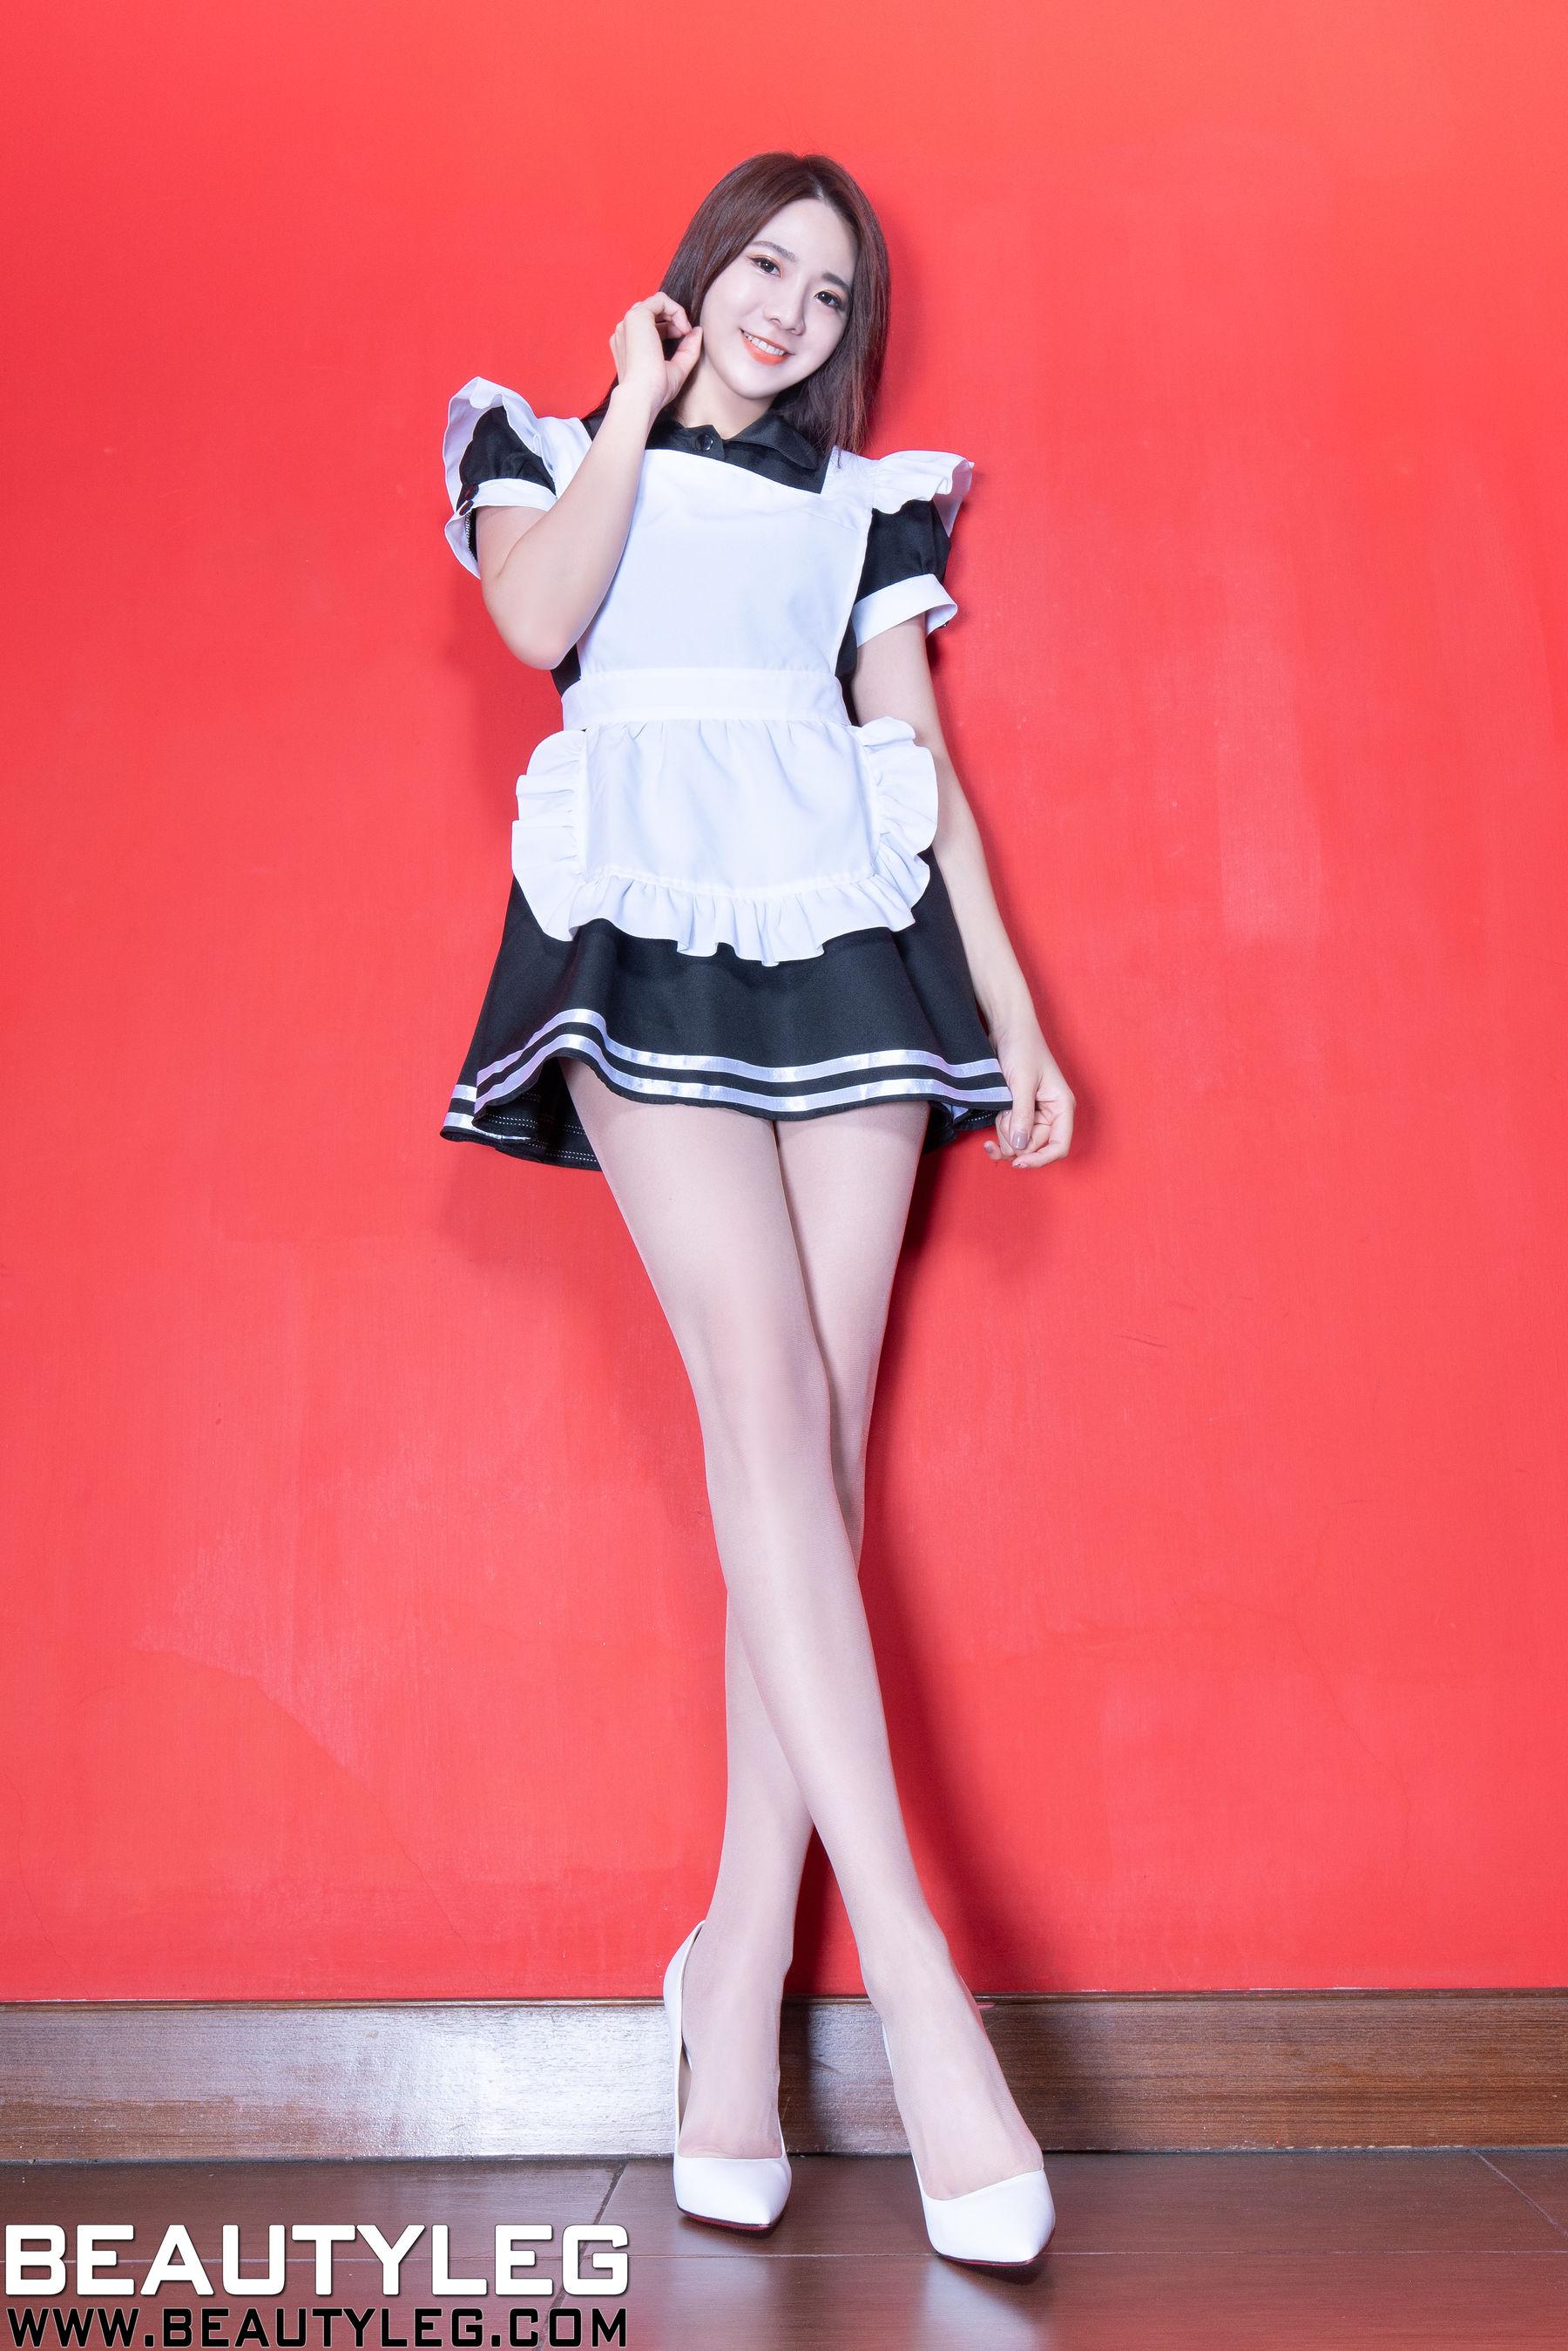 VOL.938 [Beautyleg]女仆高跟美腿:腿模Jasmine超高清个人性感漂亮大图(56P)